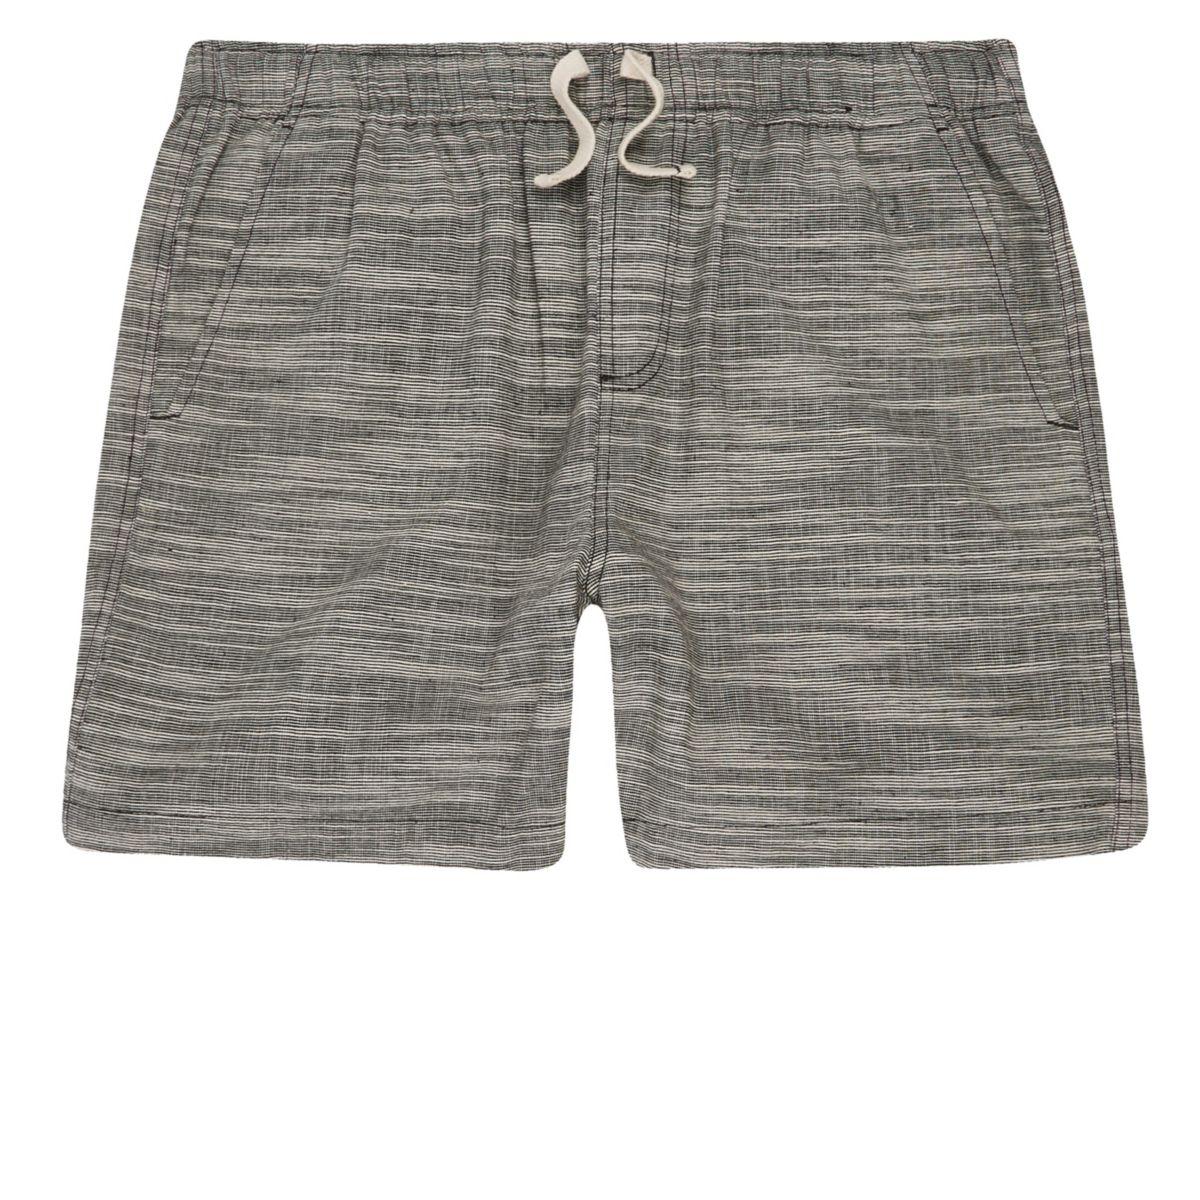 Grey textured woven shorts